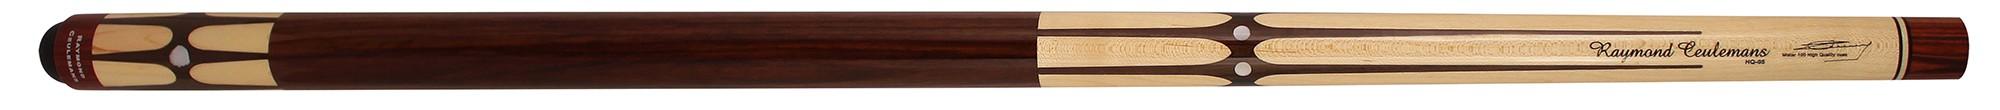 Raymond Ceulemans ® keu, HQ-05 inclusief extra top